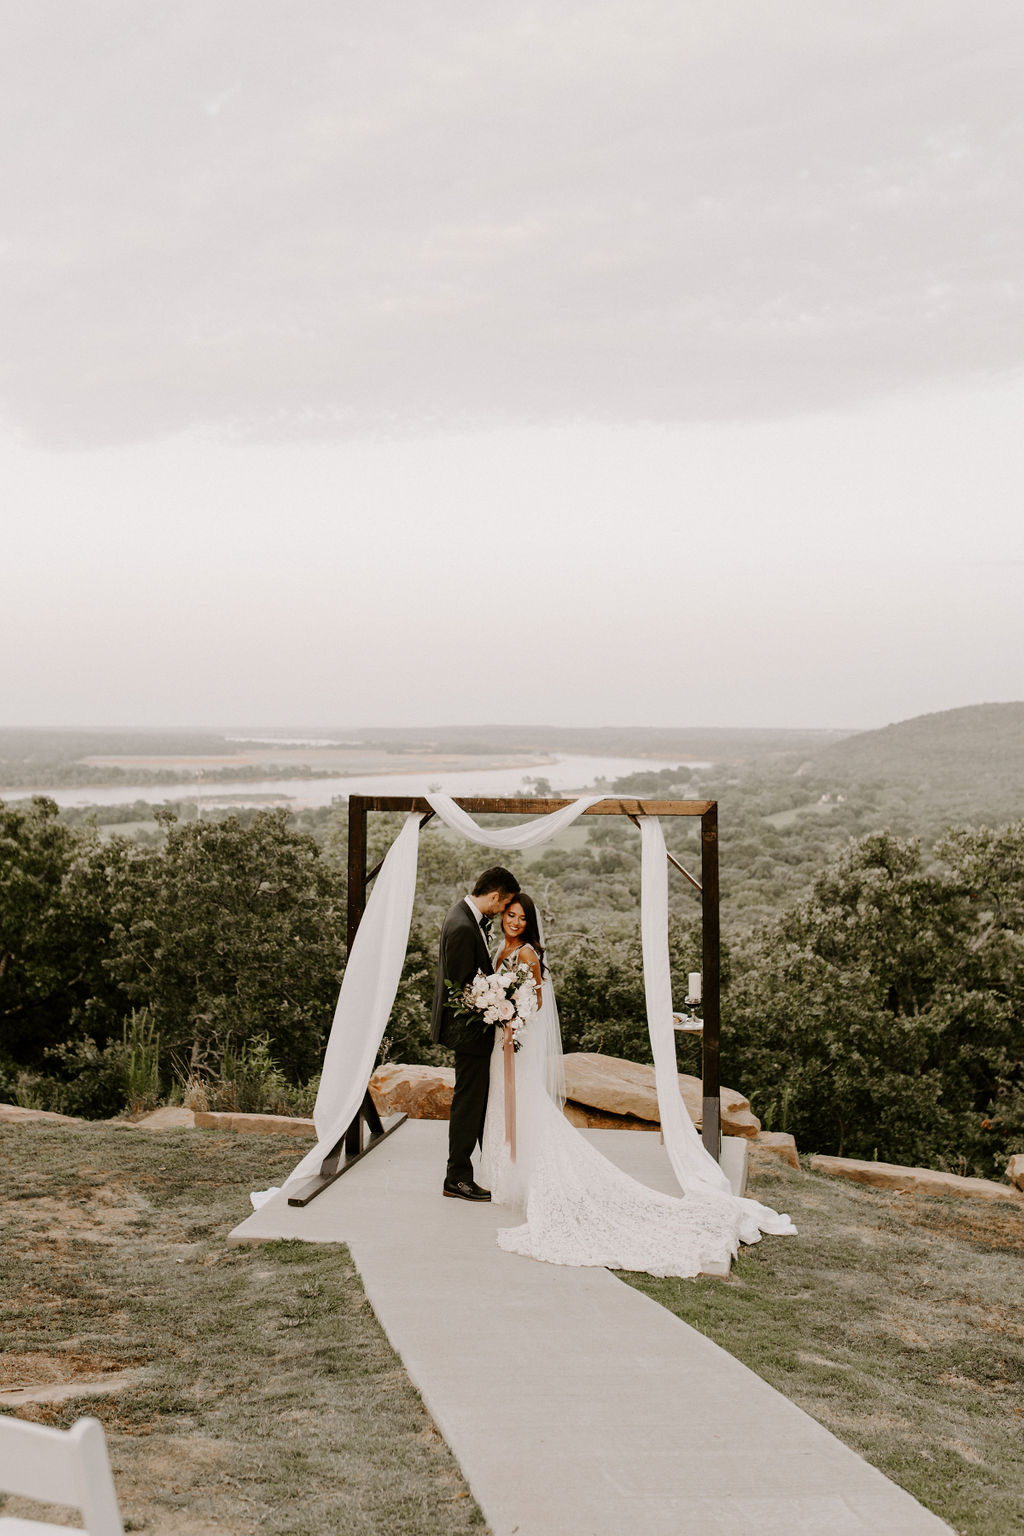 Tulsa White Barn Wedding Venue Outdoor Ceremony 115.jpg